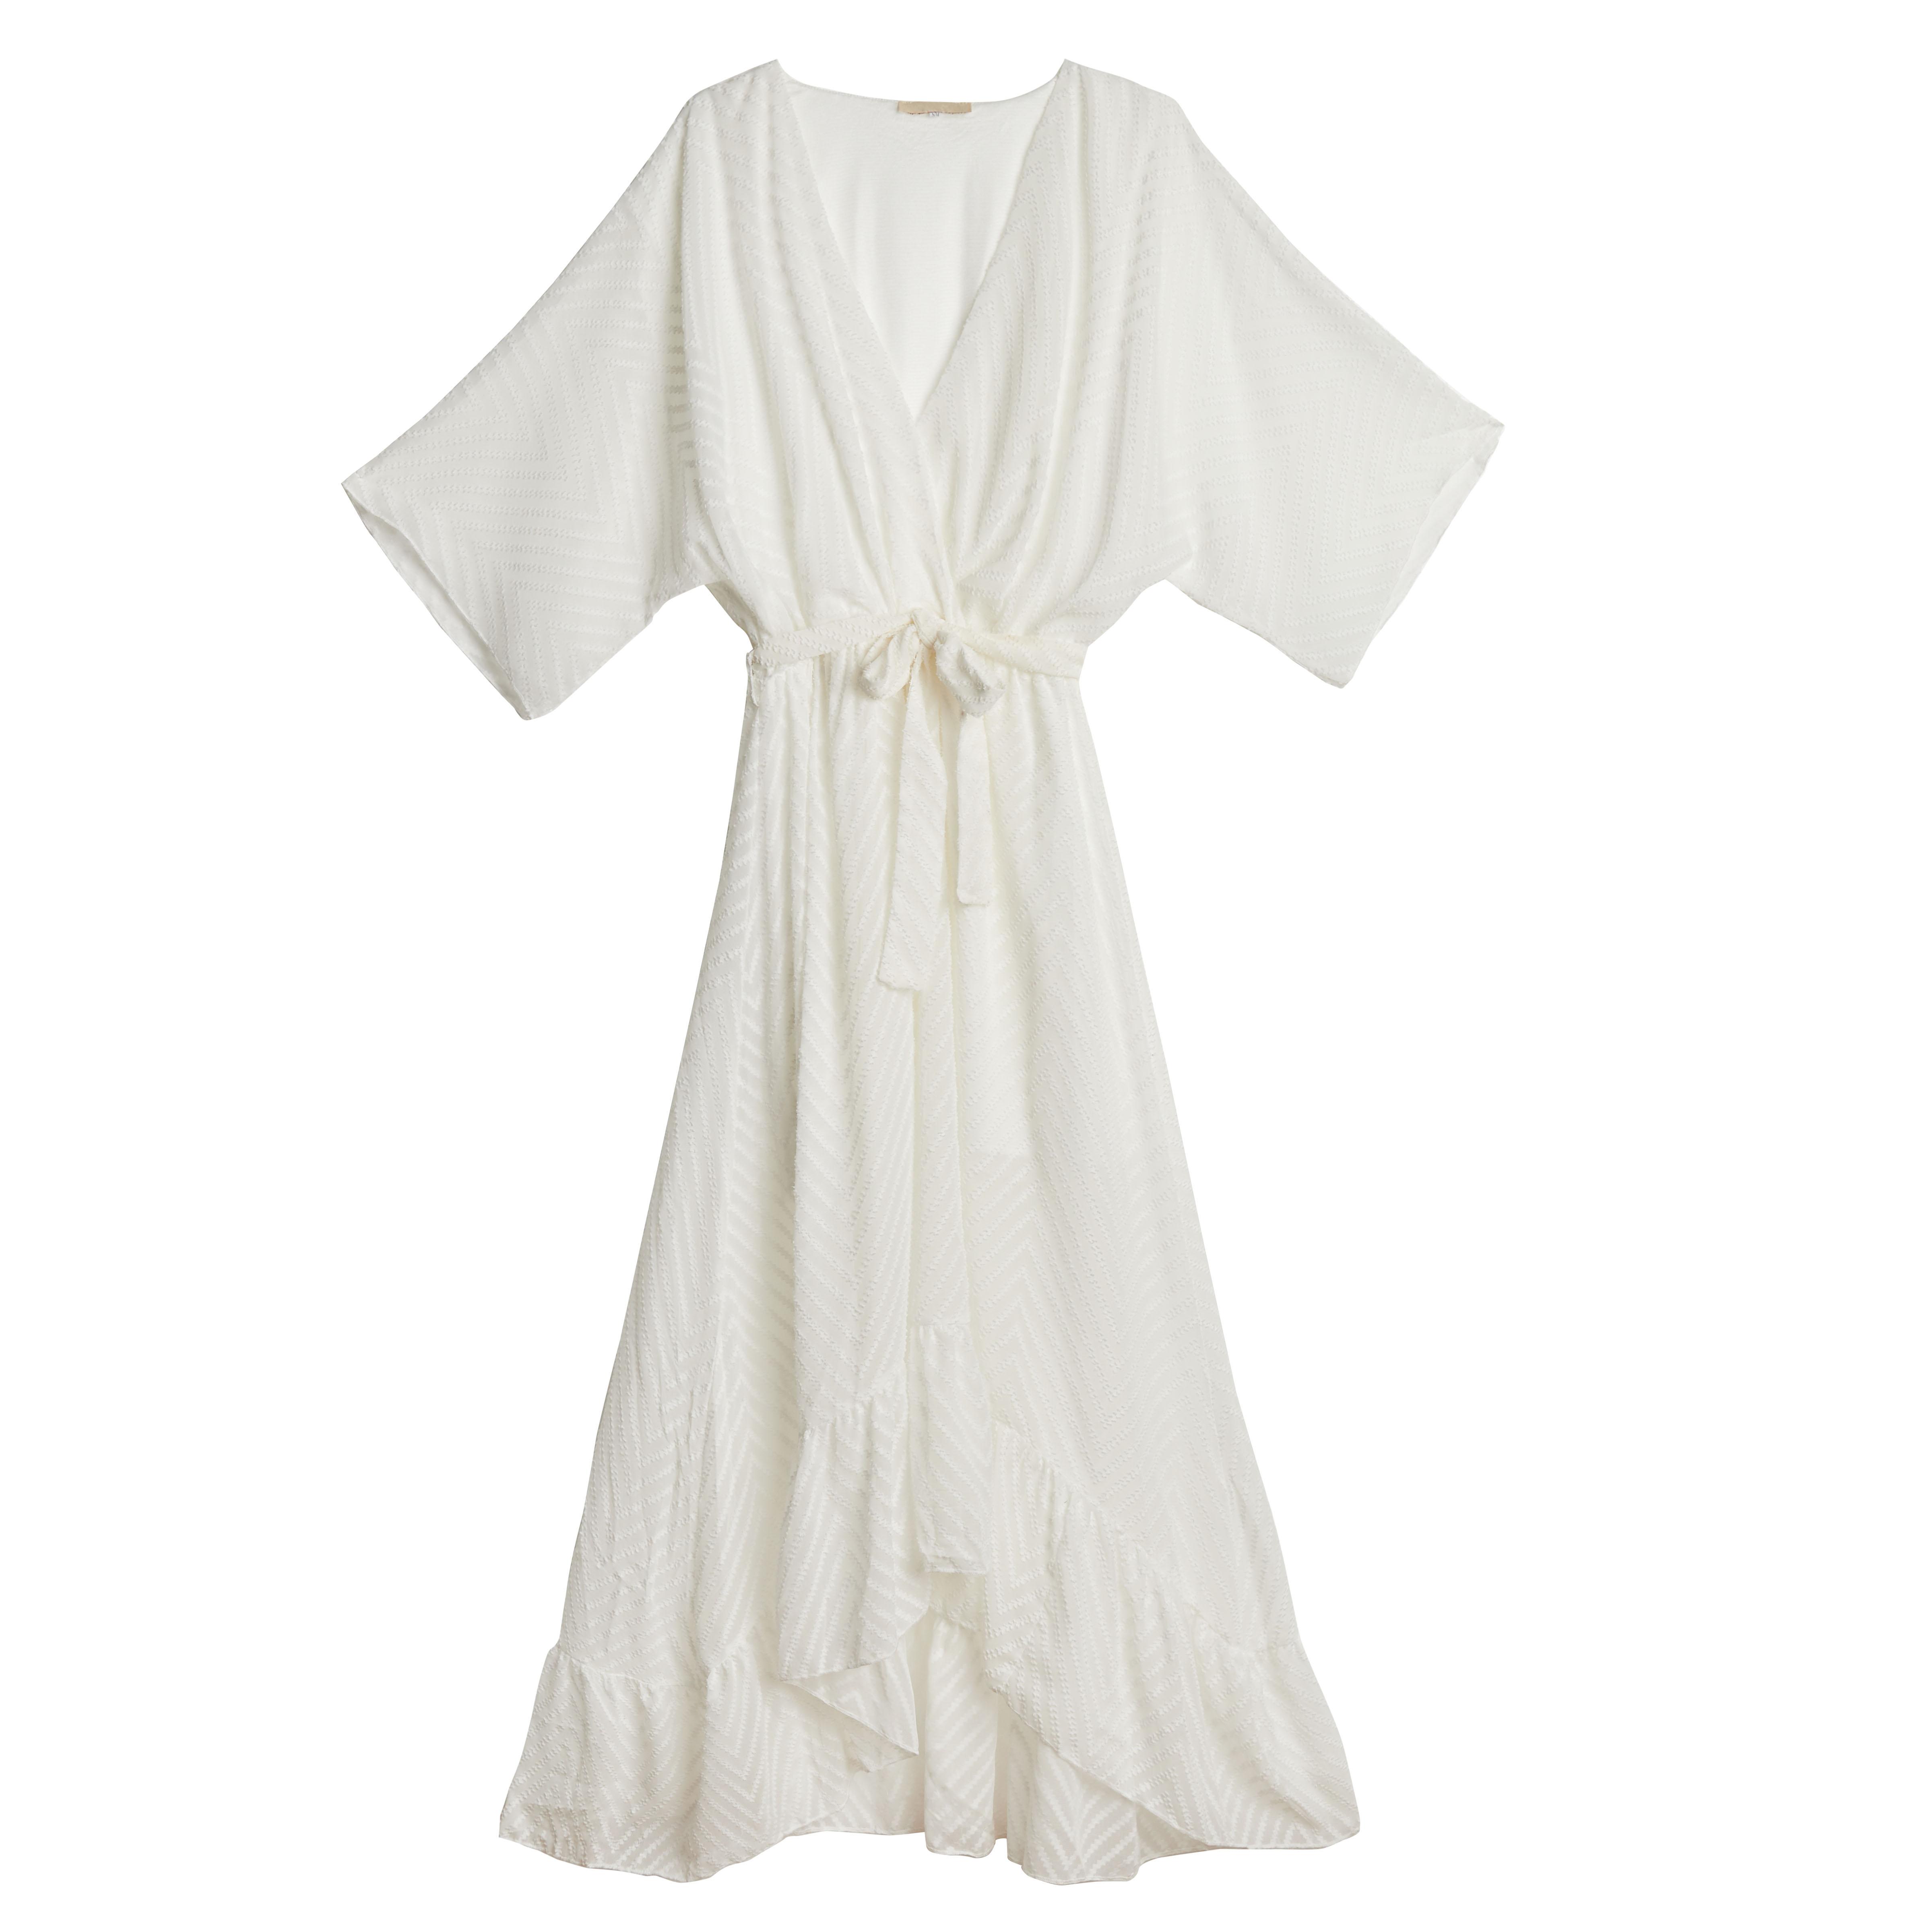 Dress romantic summer dreams